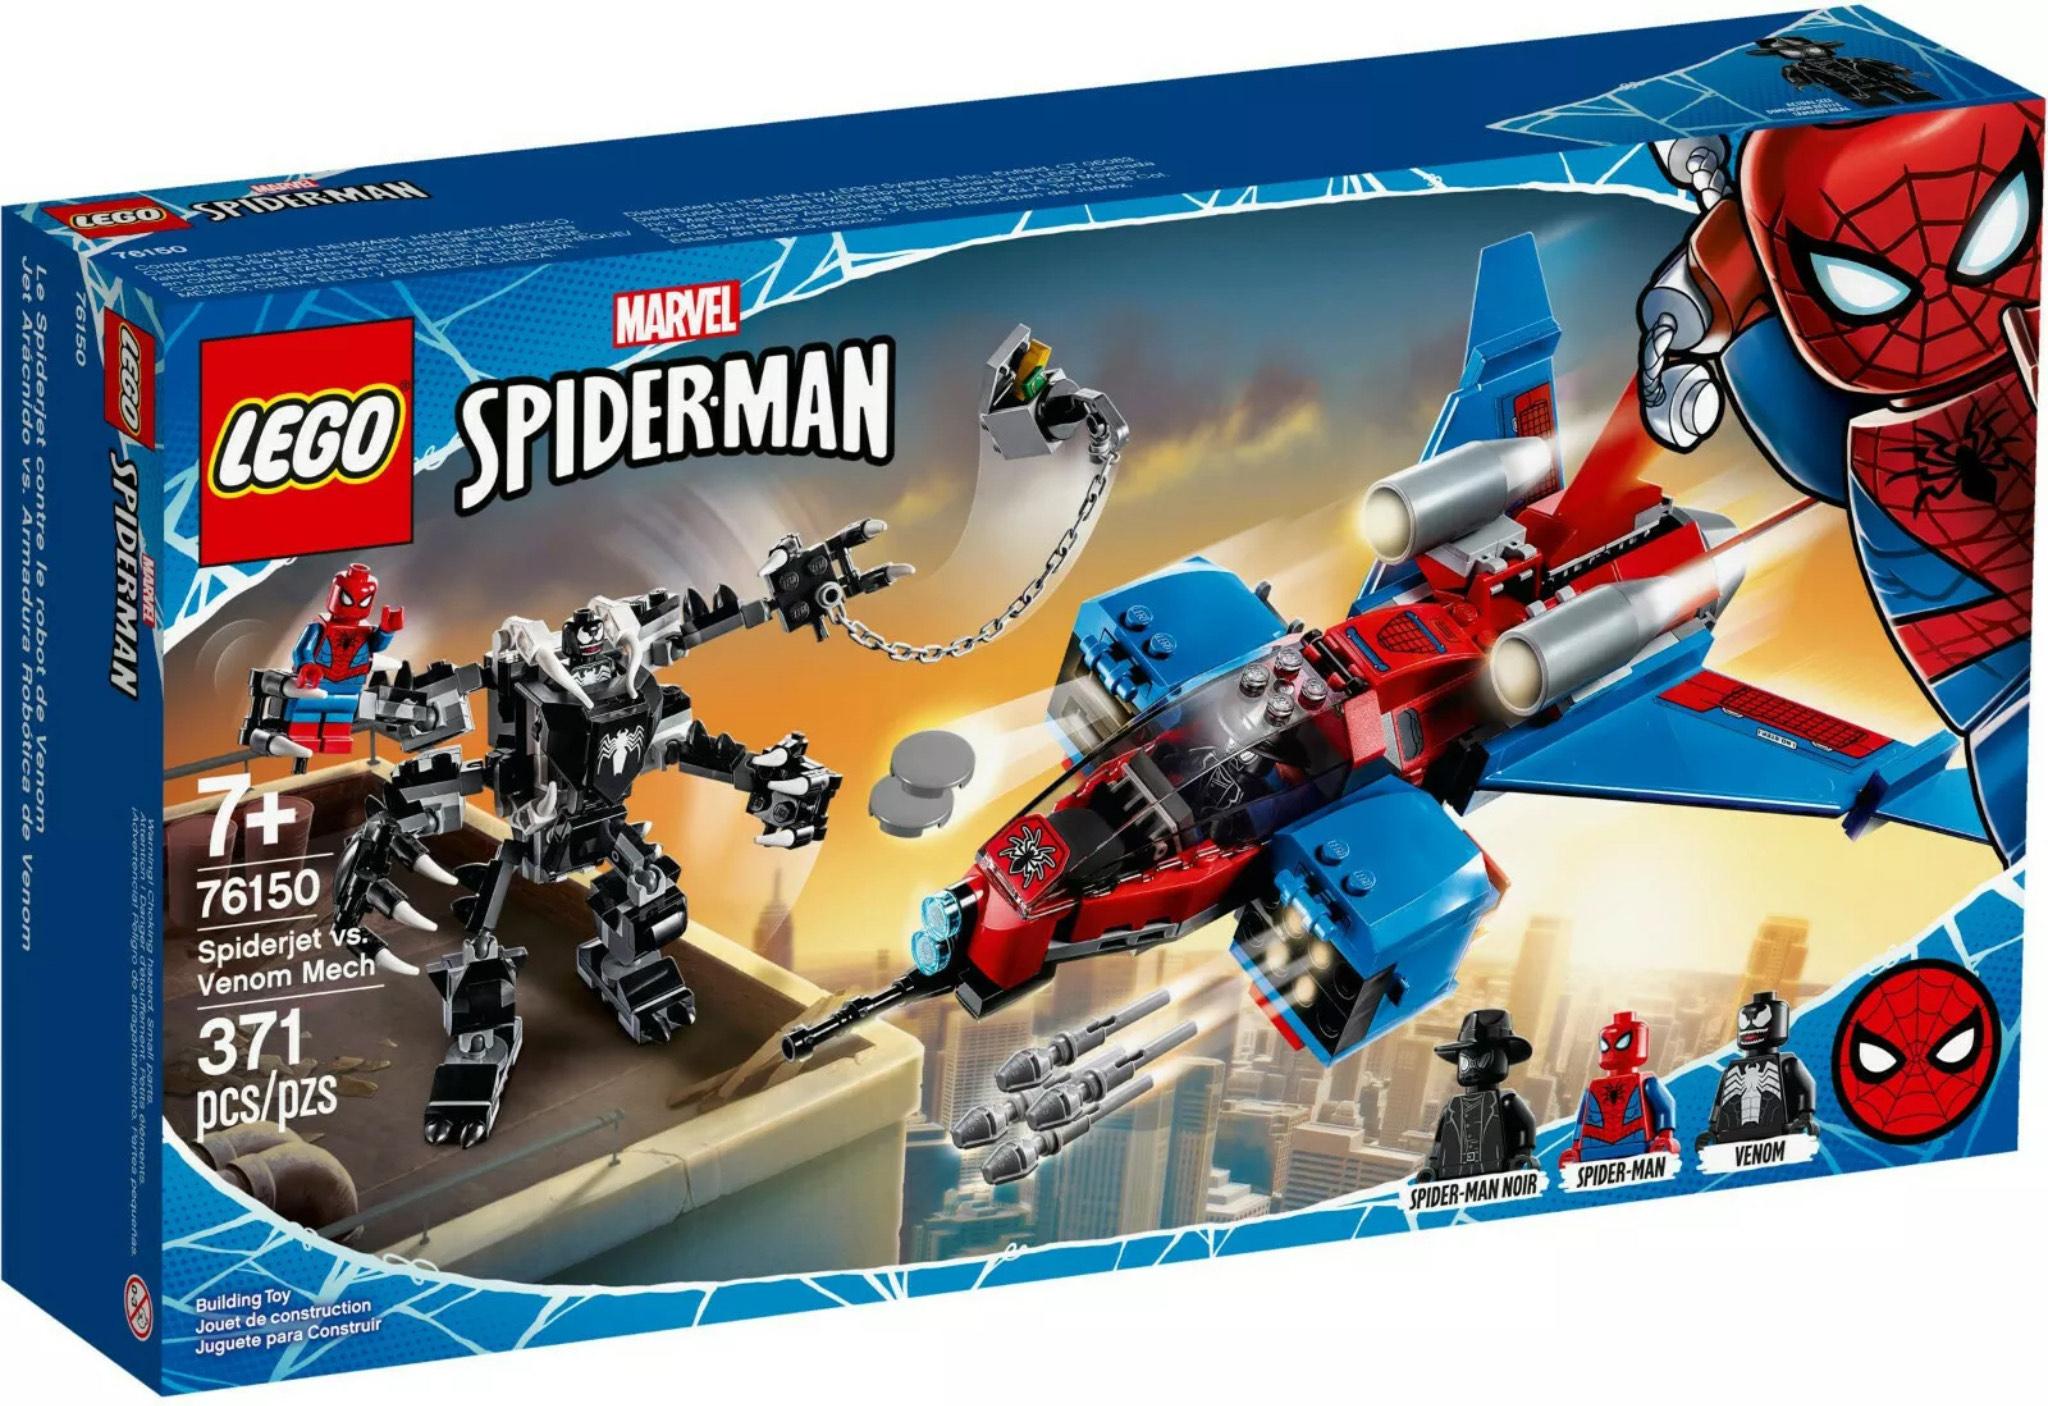 Lego 76150 Spiderjet vs. Venom Mech & 76157 Wonder woman vs Cheetah £17.50 at Sainsbury's (Pepper Hill)